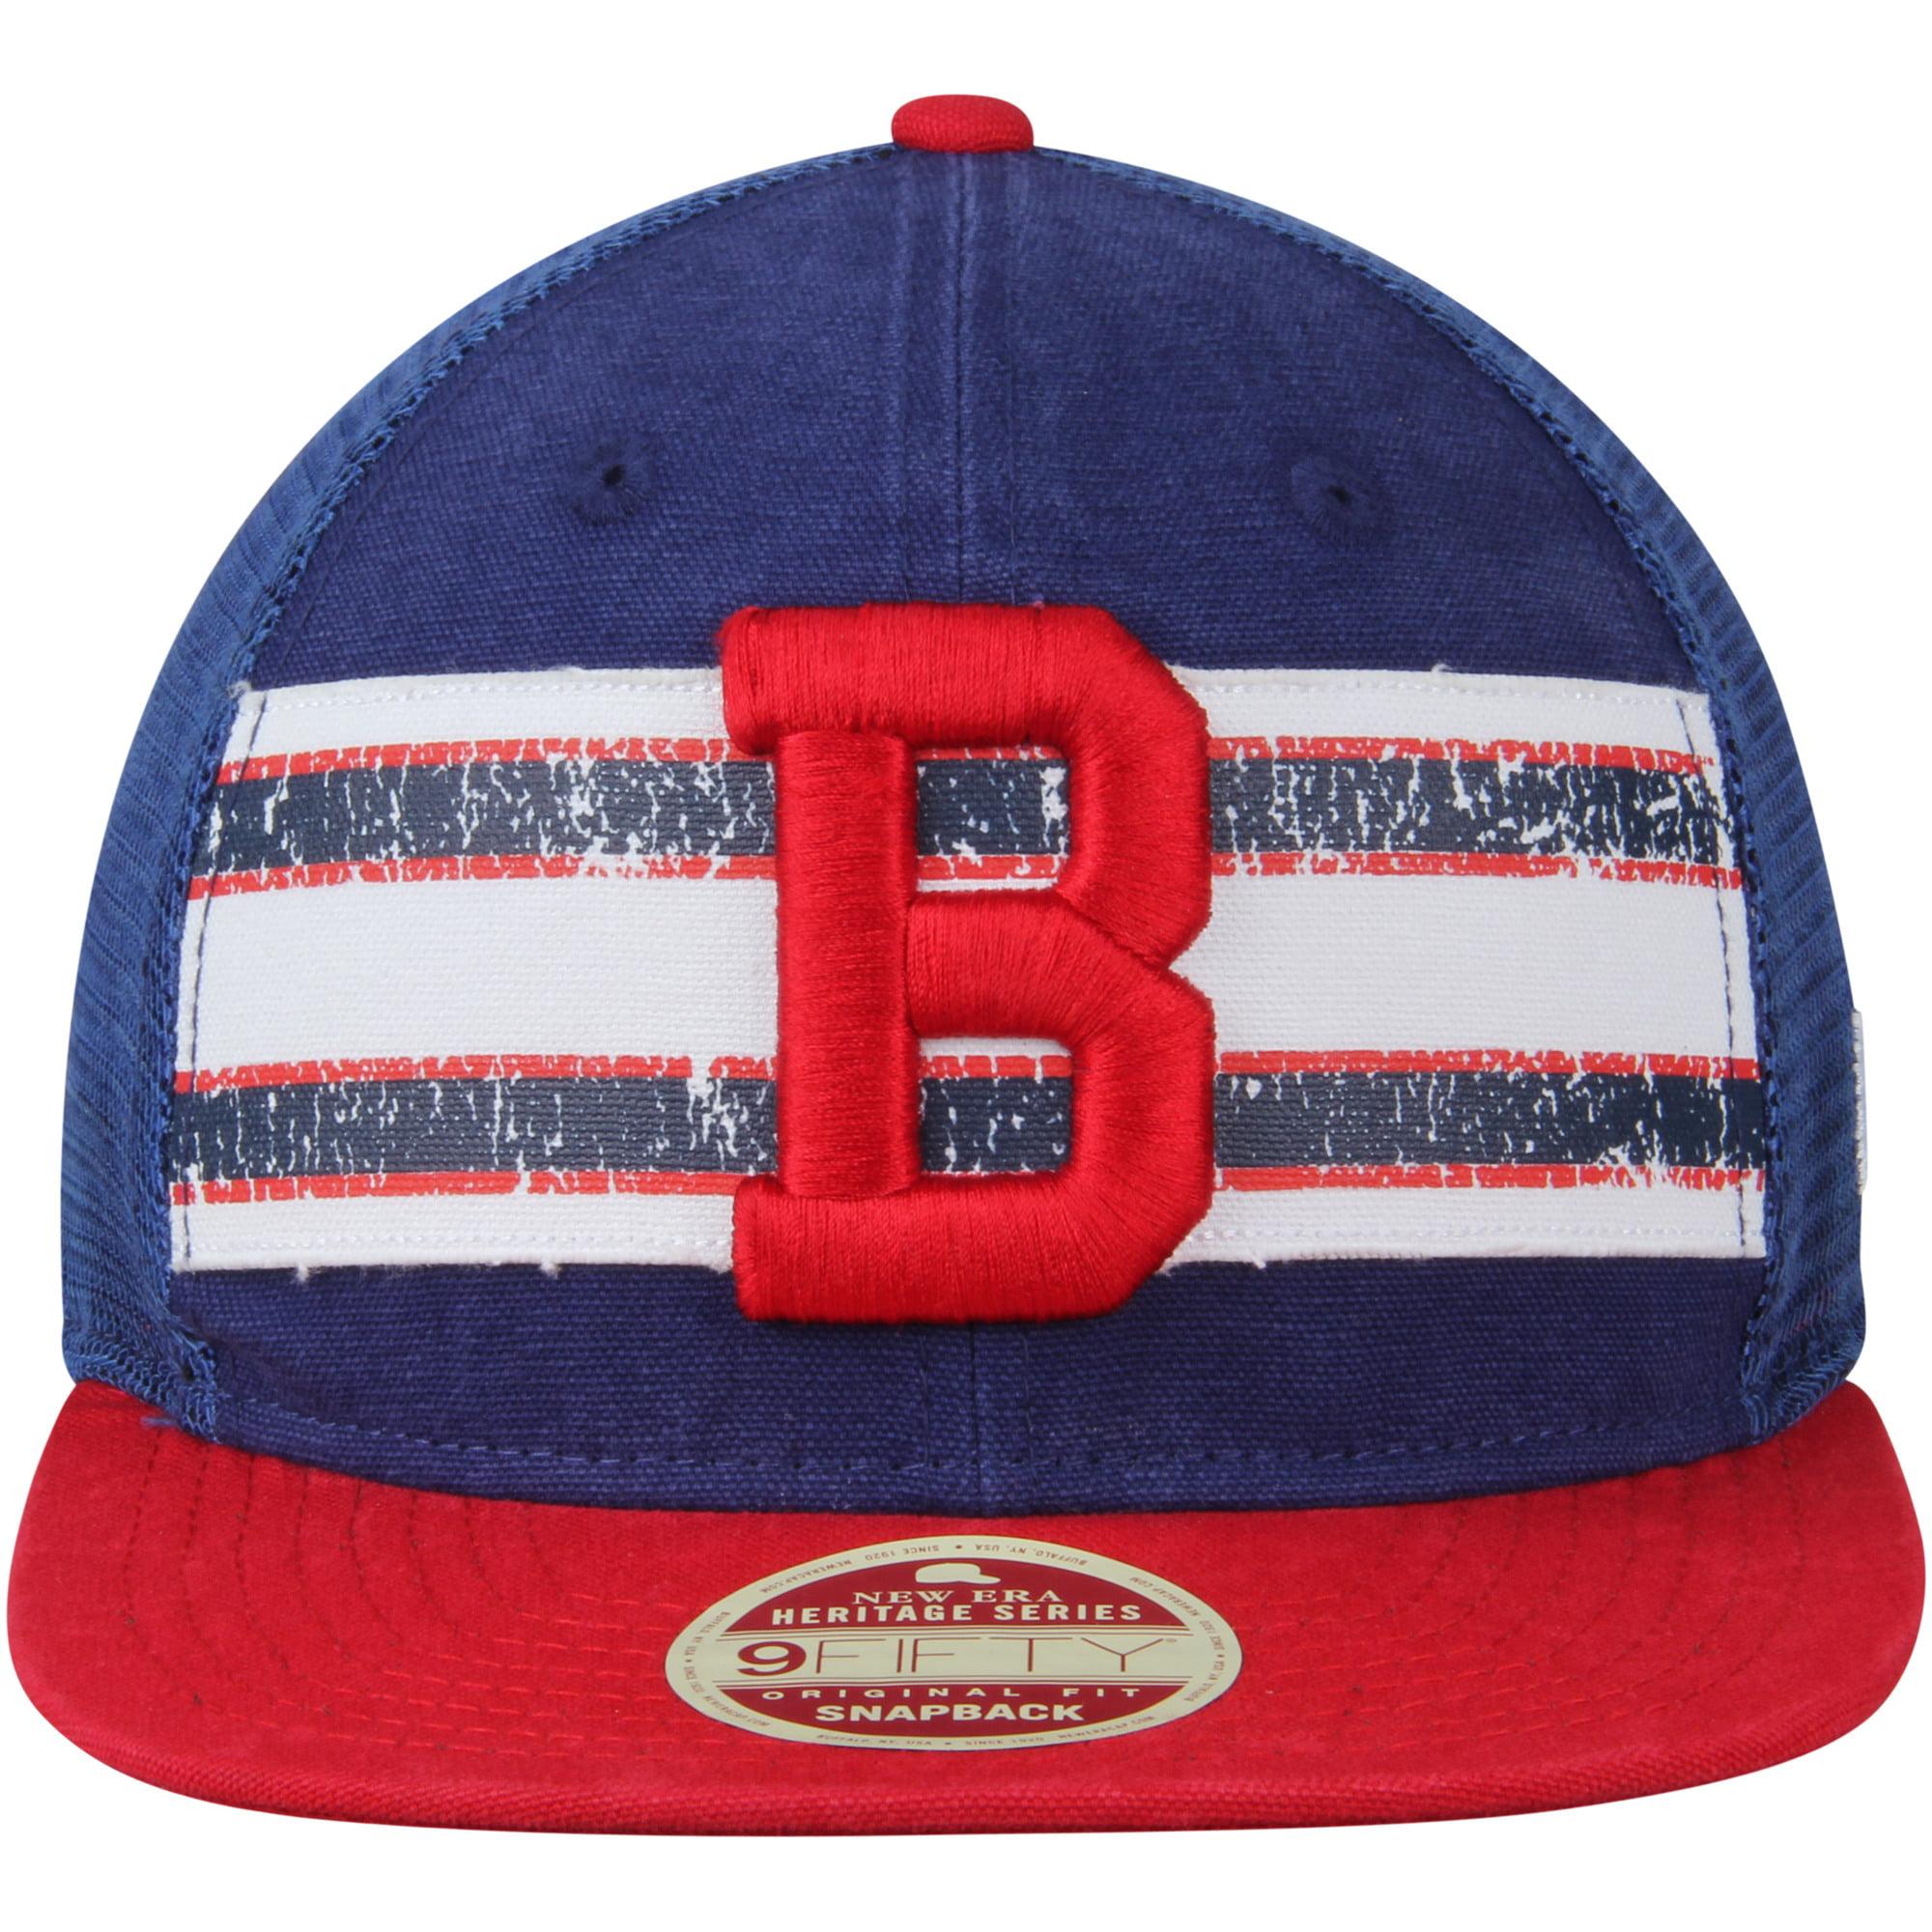 huge selection of 76ef3 435e9 Boston Red Sox New Era Vintage Throwback Stripe 9FIFTY Adjustable Snapback  Hat - Navy Red - OSFA - Walmart.com